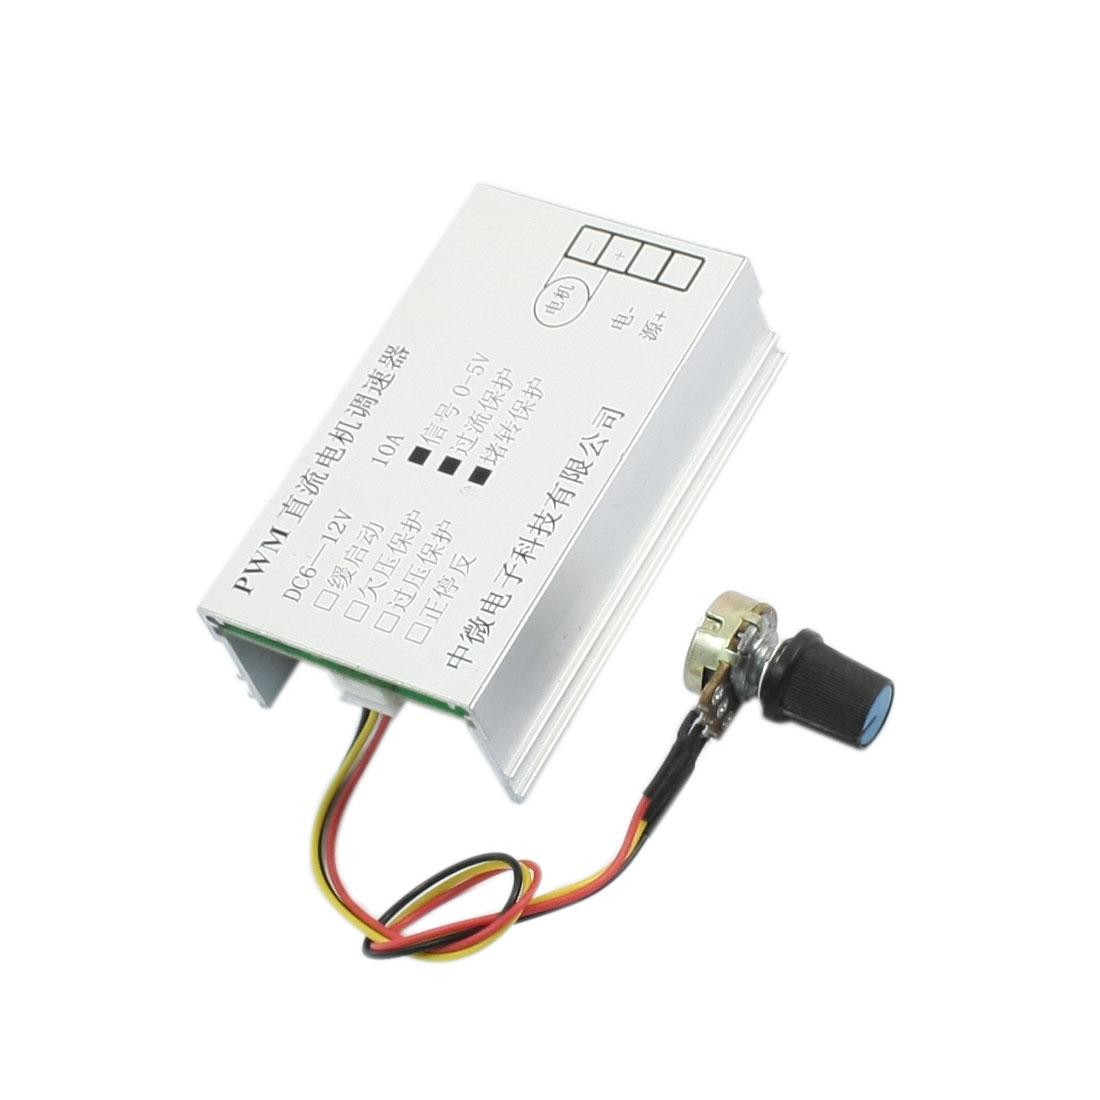 DC 6-12V 10A Adjustable Rotary B10K Potentiometer Knob PWM Motor Speed Controller Governor Regulator Module w Heat Sink